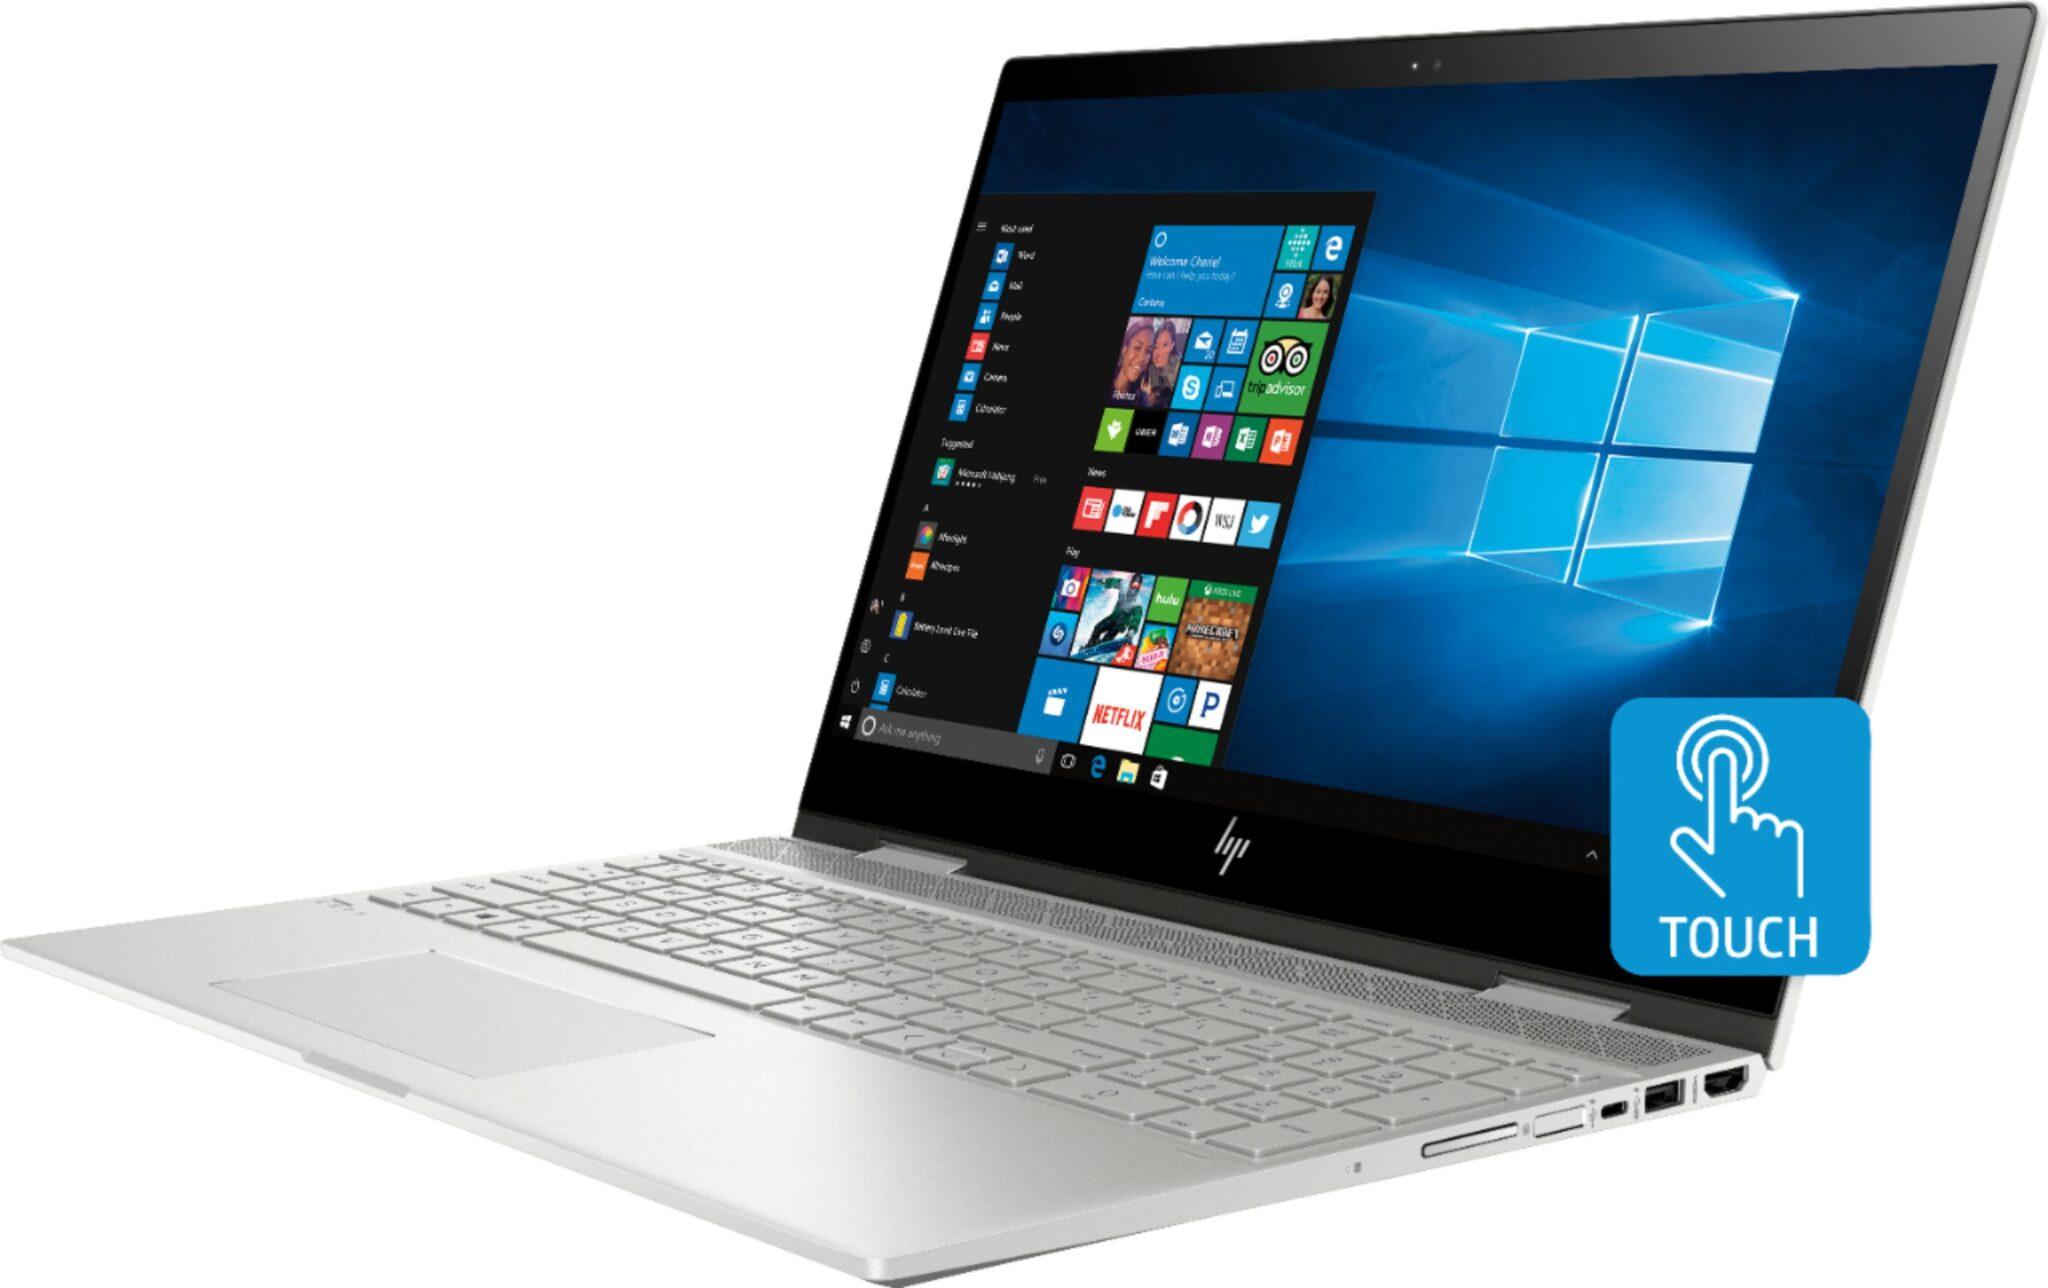 HP aggiorna i suoi convertibili HP Envy e HP Envy x360 | Evosmart.it